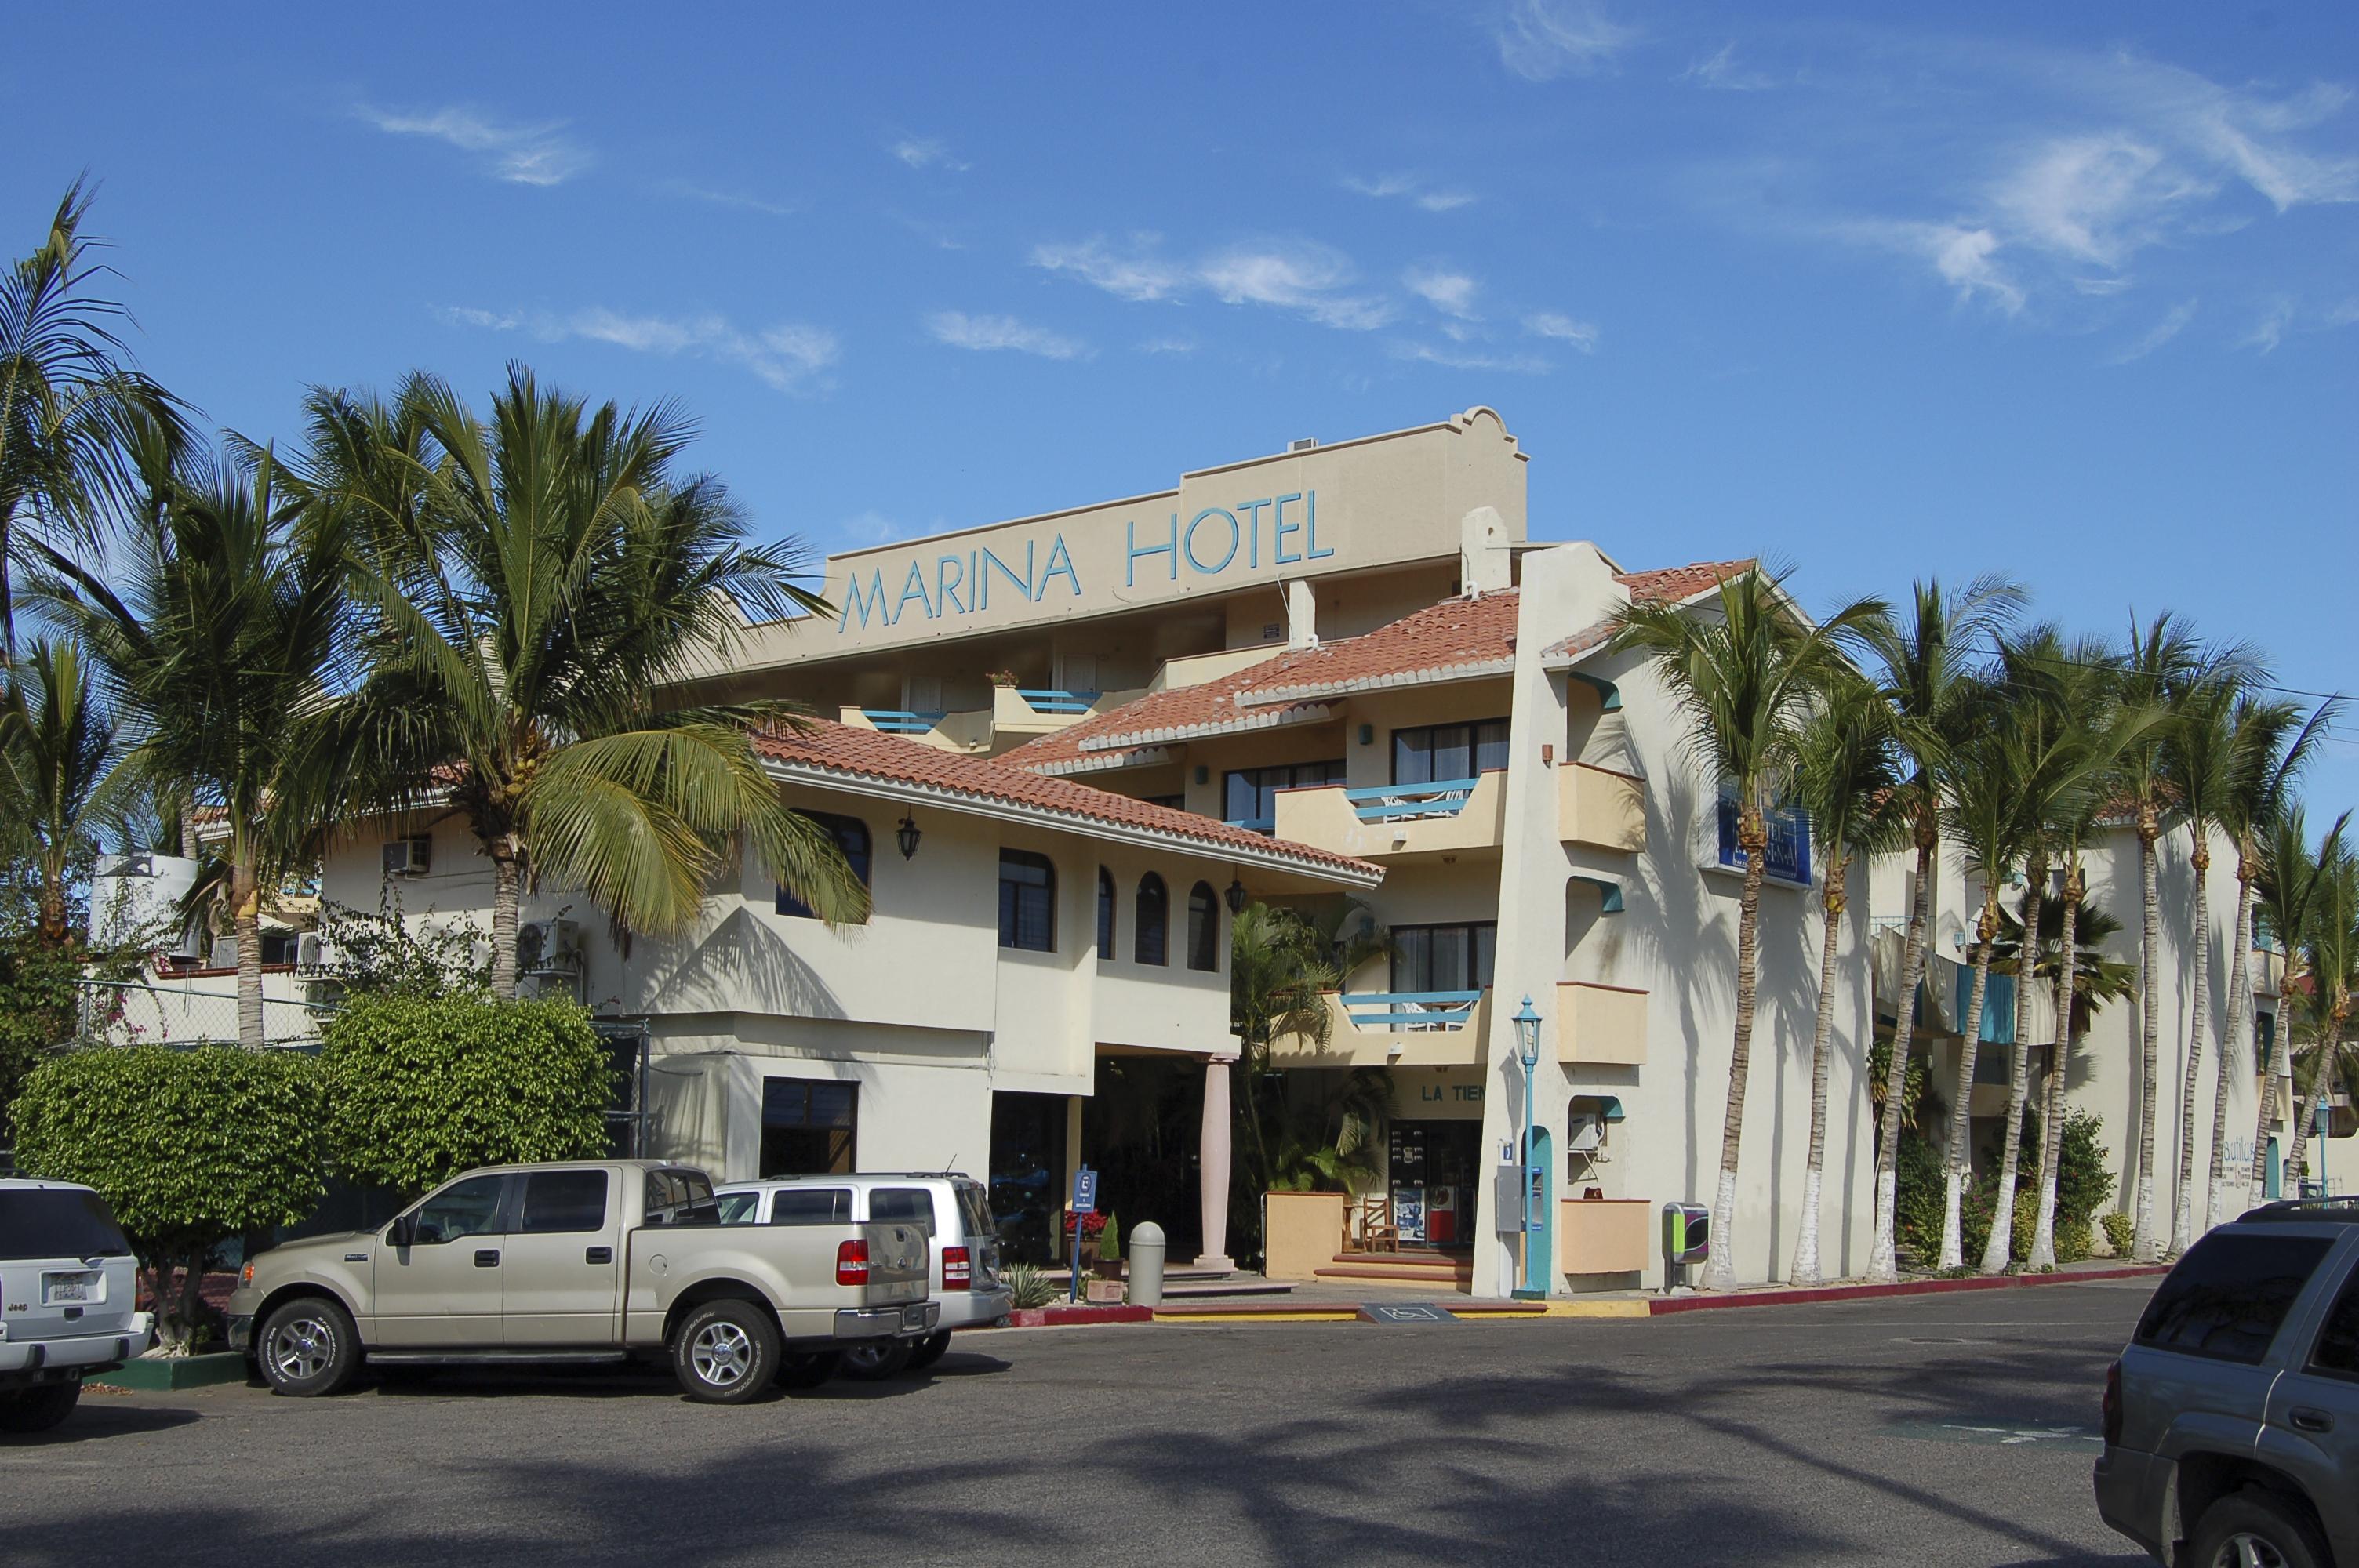 Hotel Marina, La Paz, Baja Sur